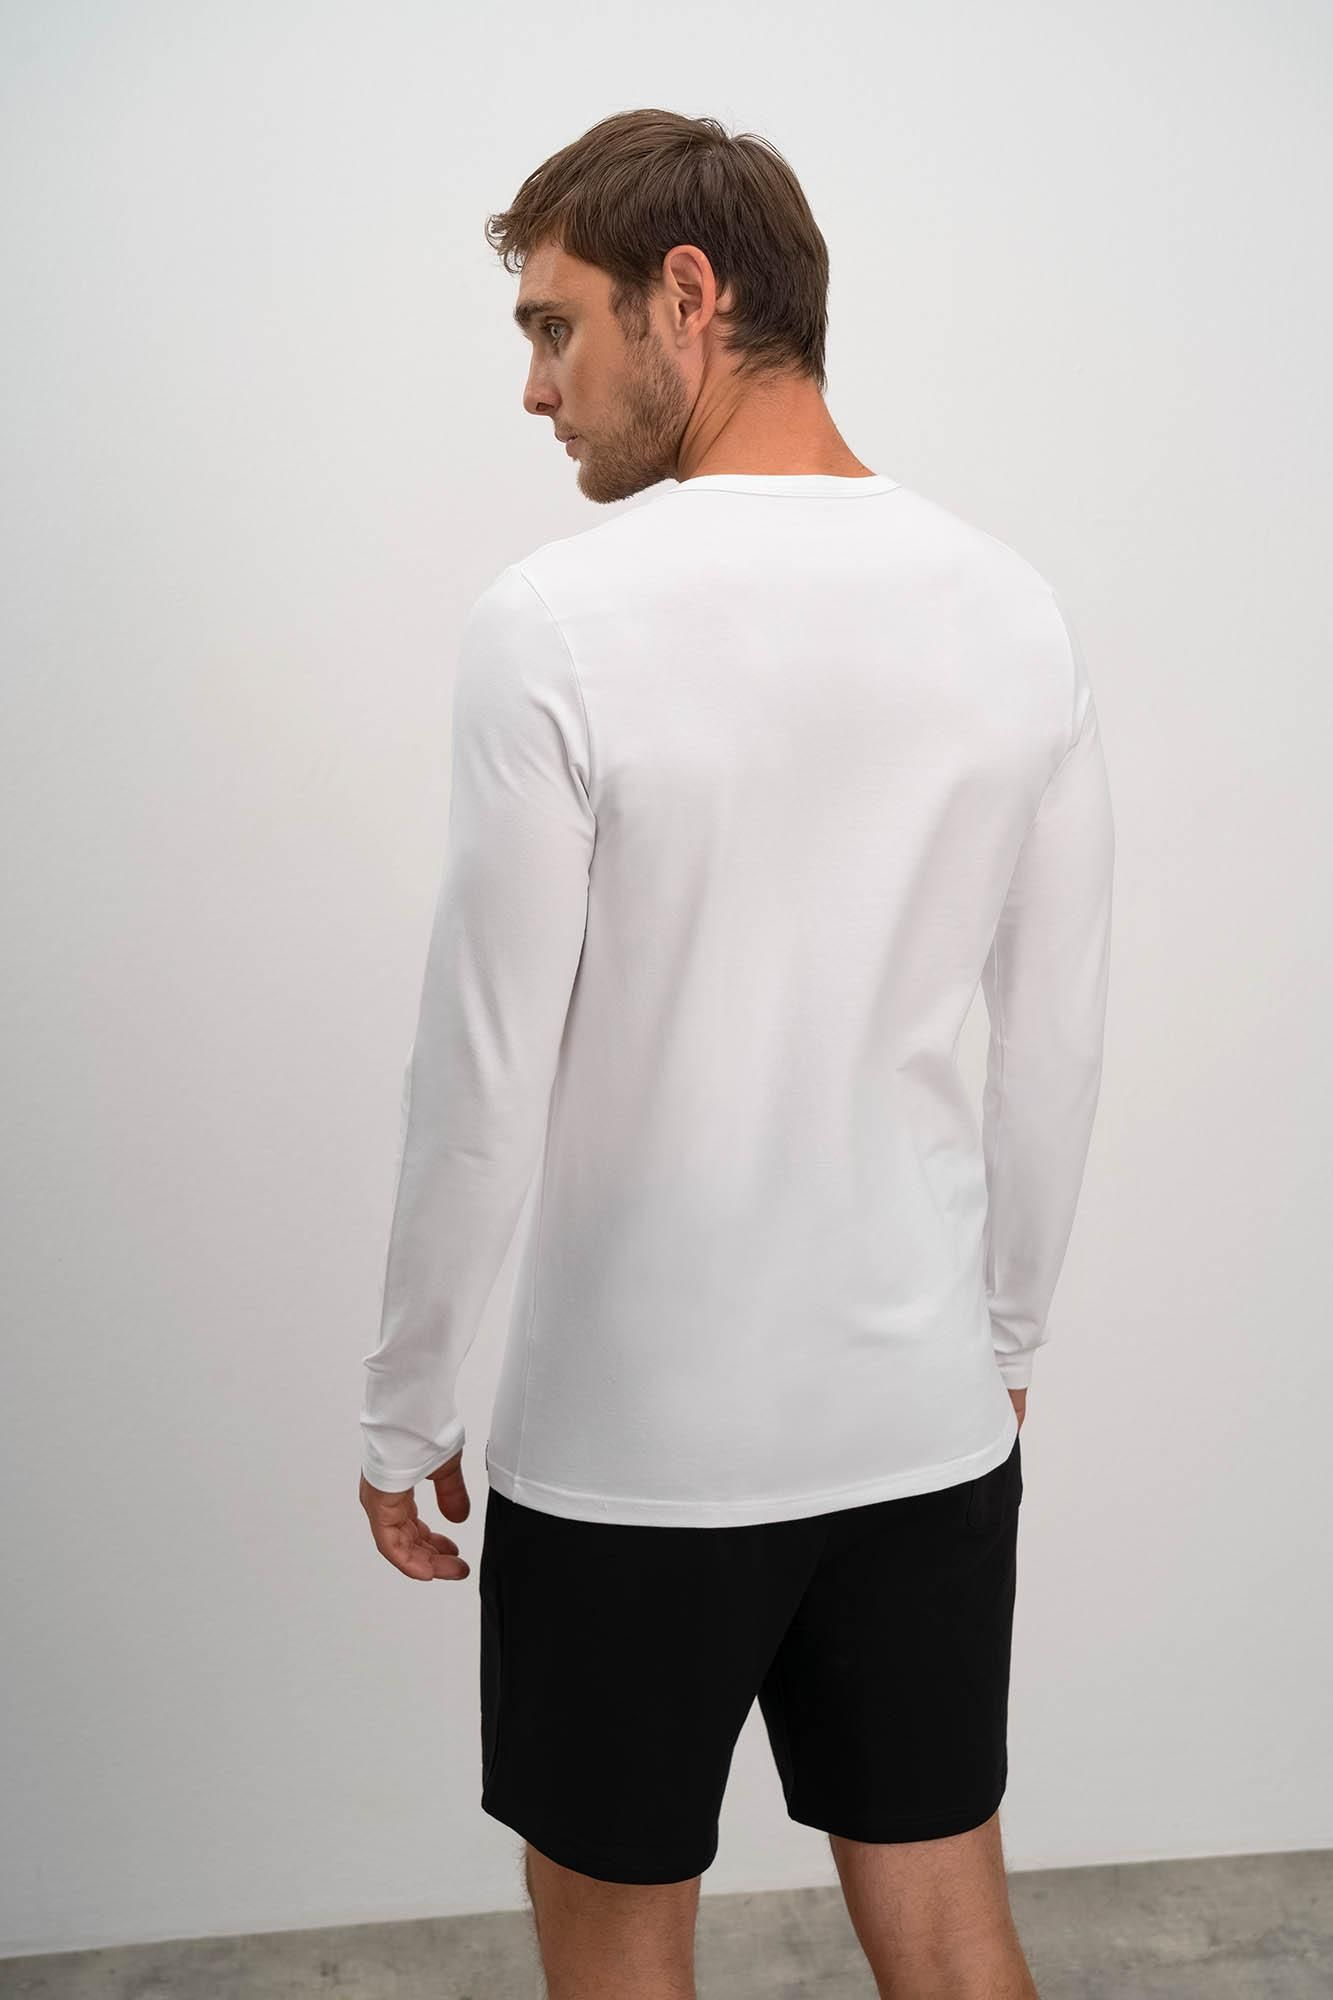 Men's 2 Pack Long Sleeve Cotton Vests